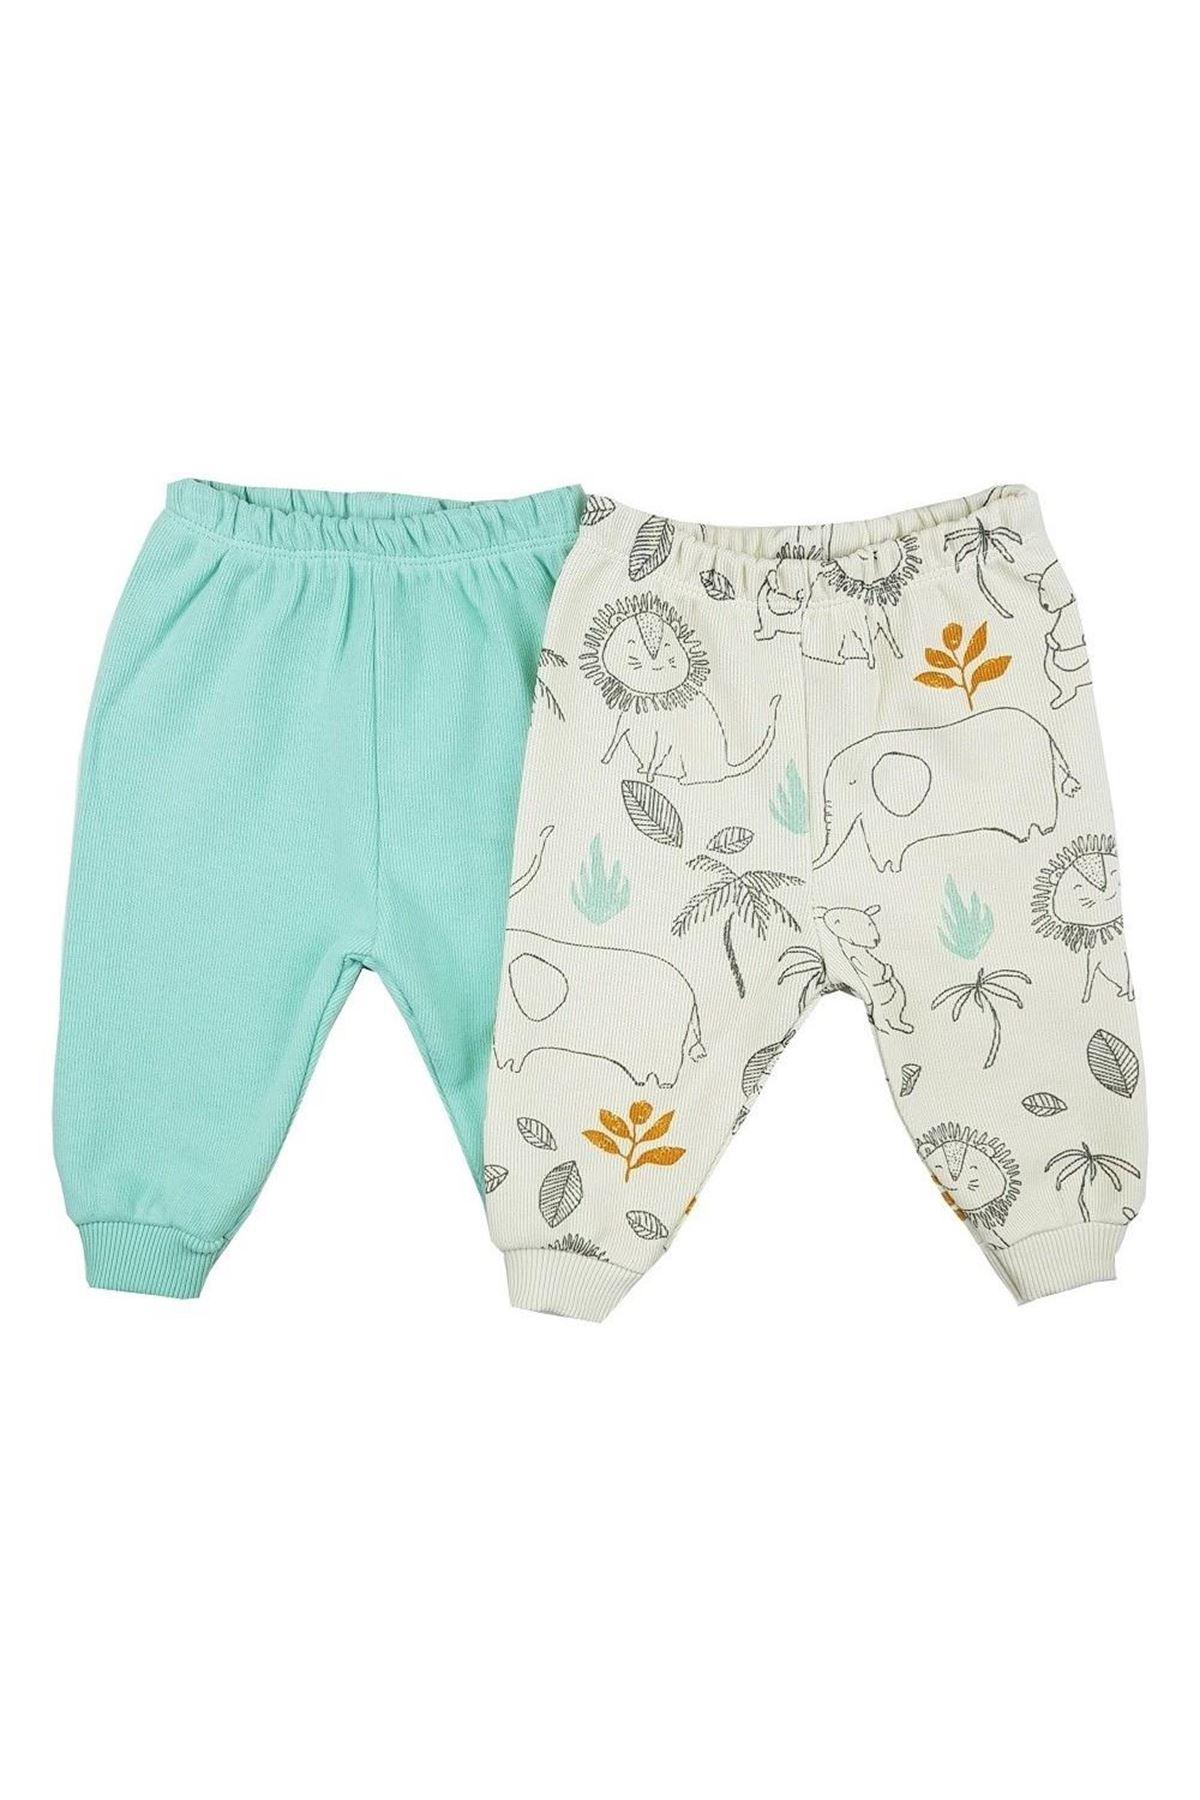 Luggi Baby Selanik 2li Tek Alt Pantolon LG-6107 Karışık Renkli